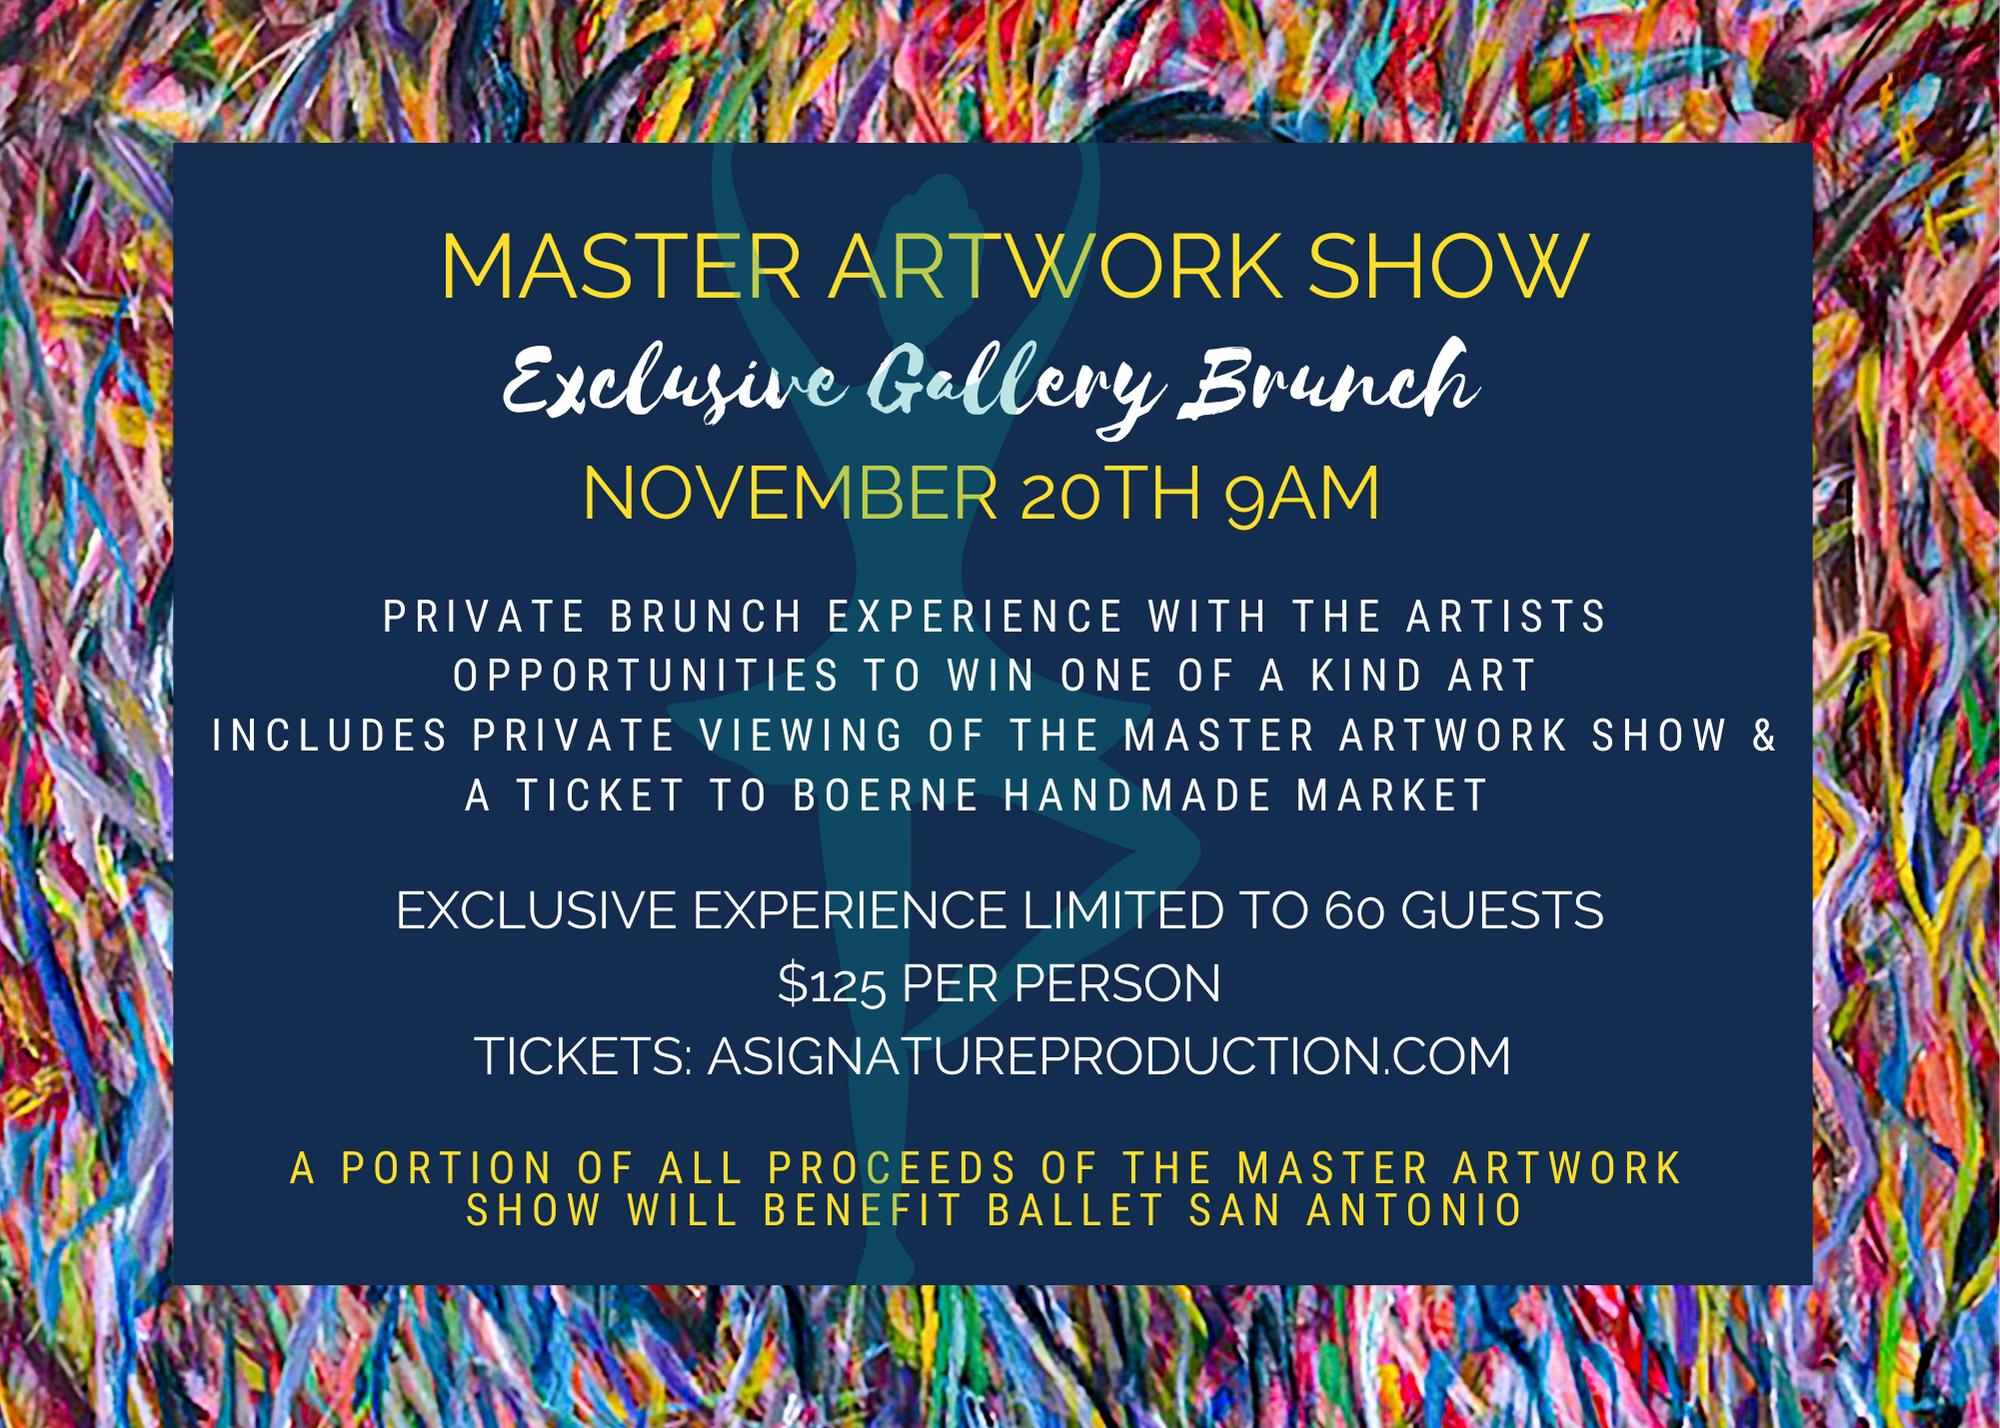 Master Artwork Show Exclusive Gallery Brunch Bevy Hotel Boerne Texas